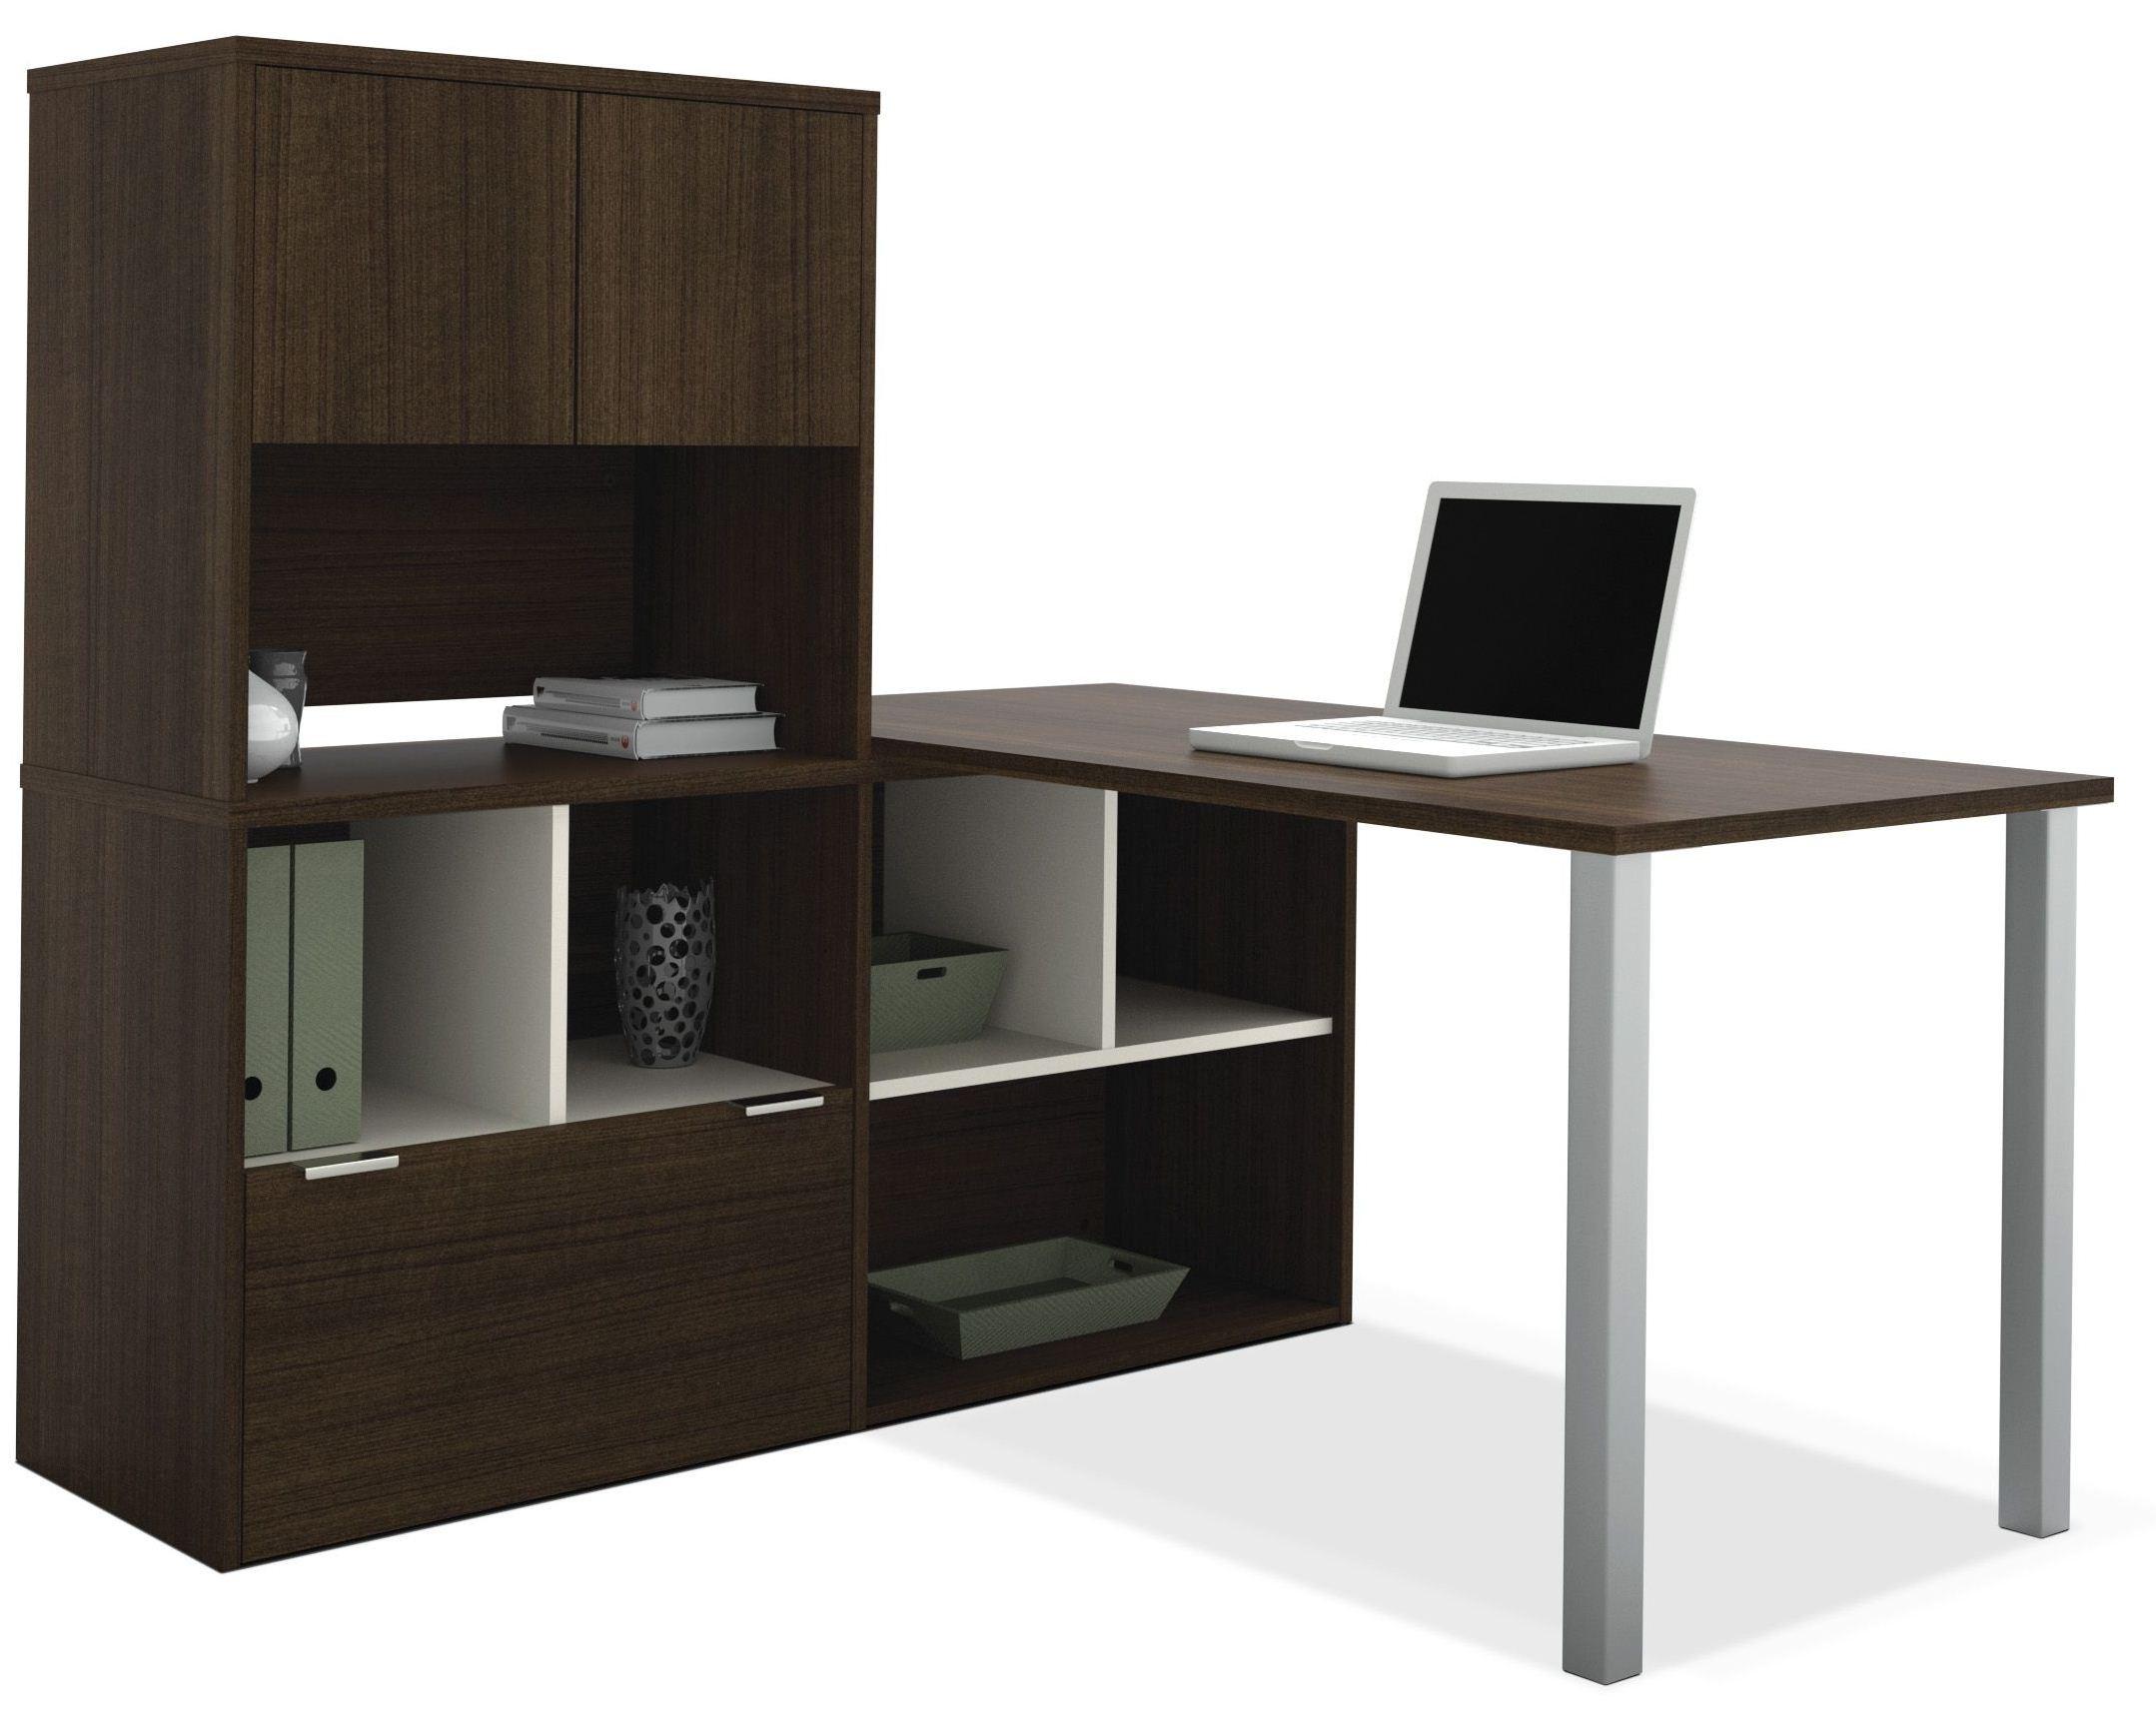 Contempo Tuxedo L Shaped Desk With Hutch From Bestar